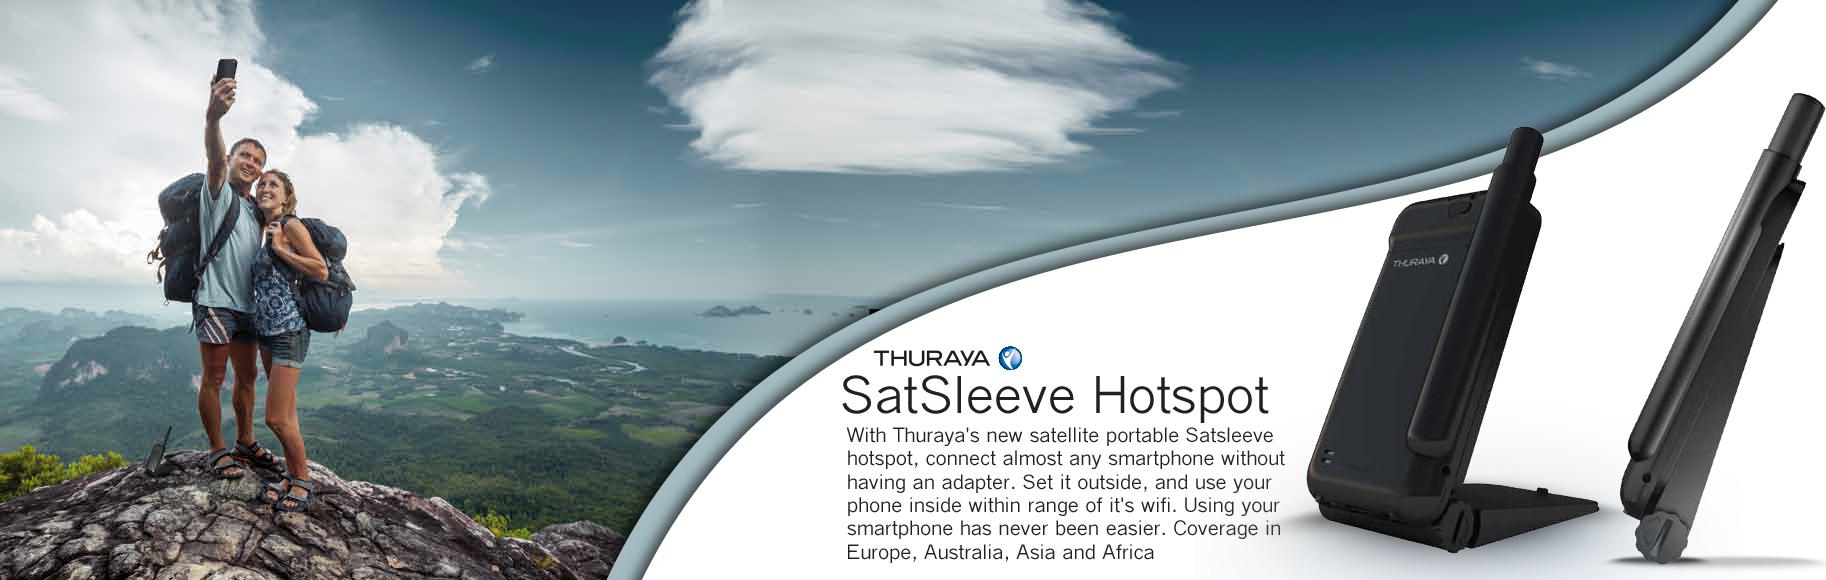 thuraya-satsleeve-hotspot-banner-1.jpg